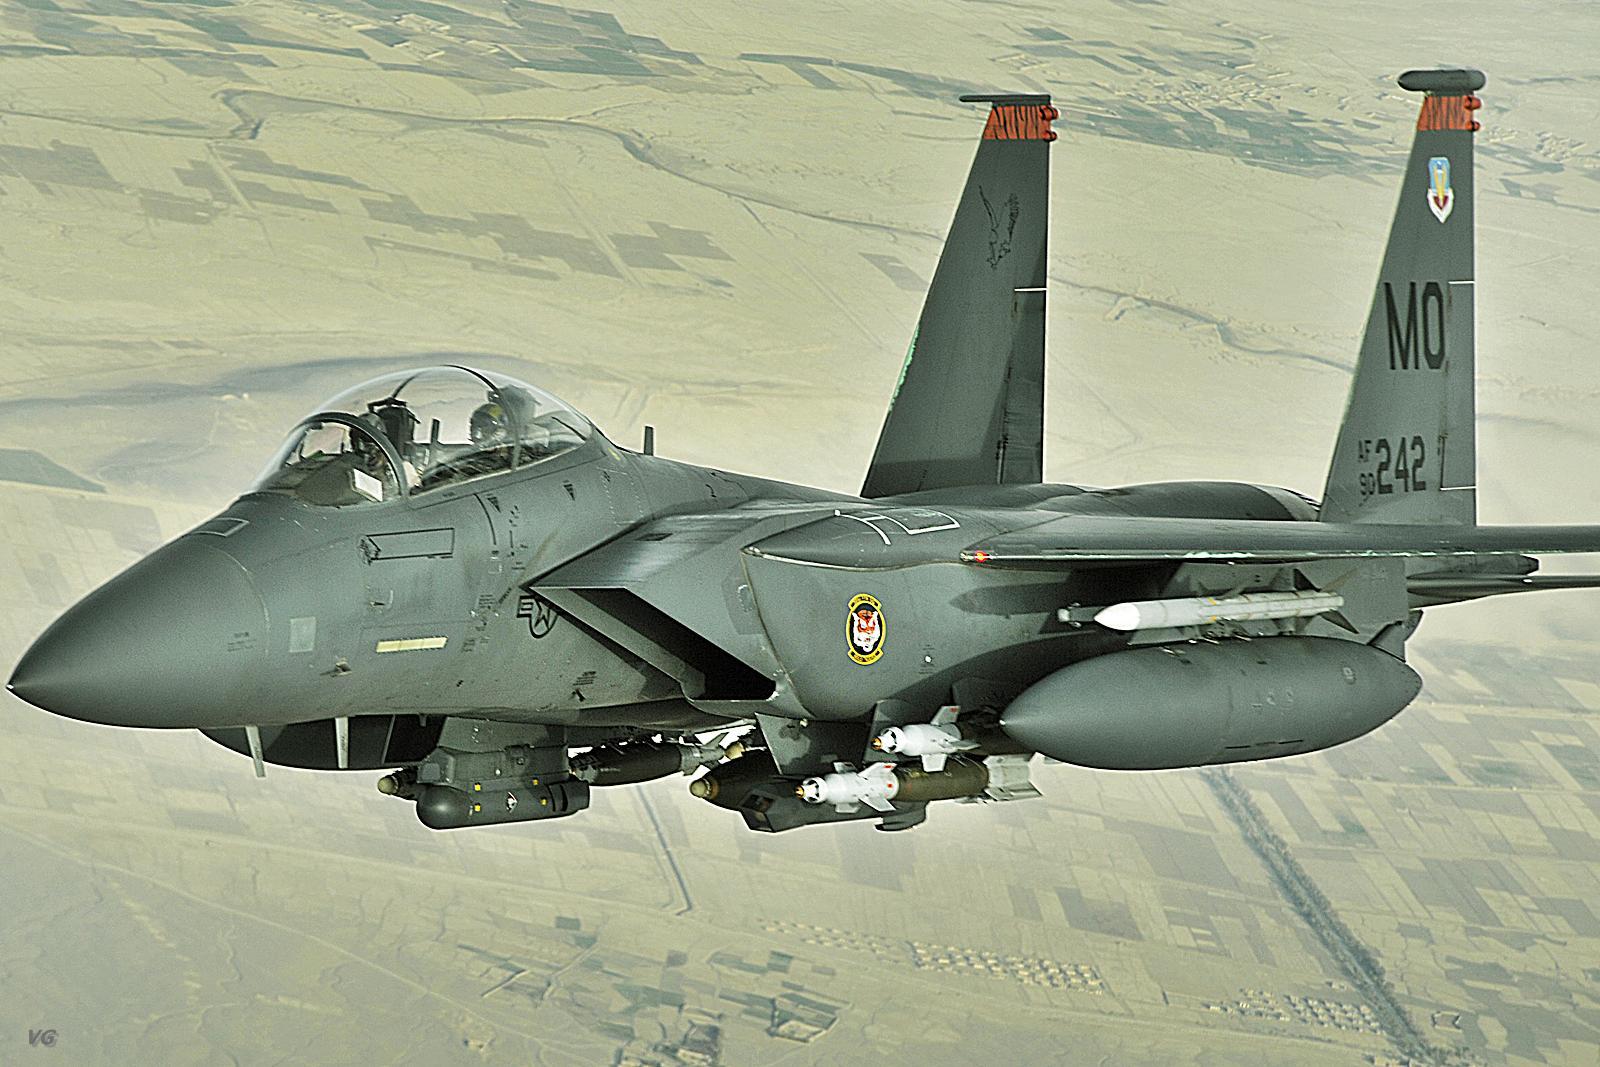 F 15SE (航空機)の画像 p1_39